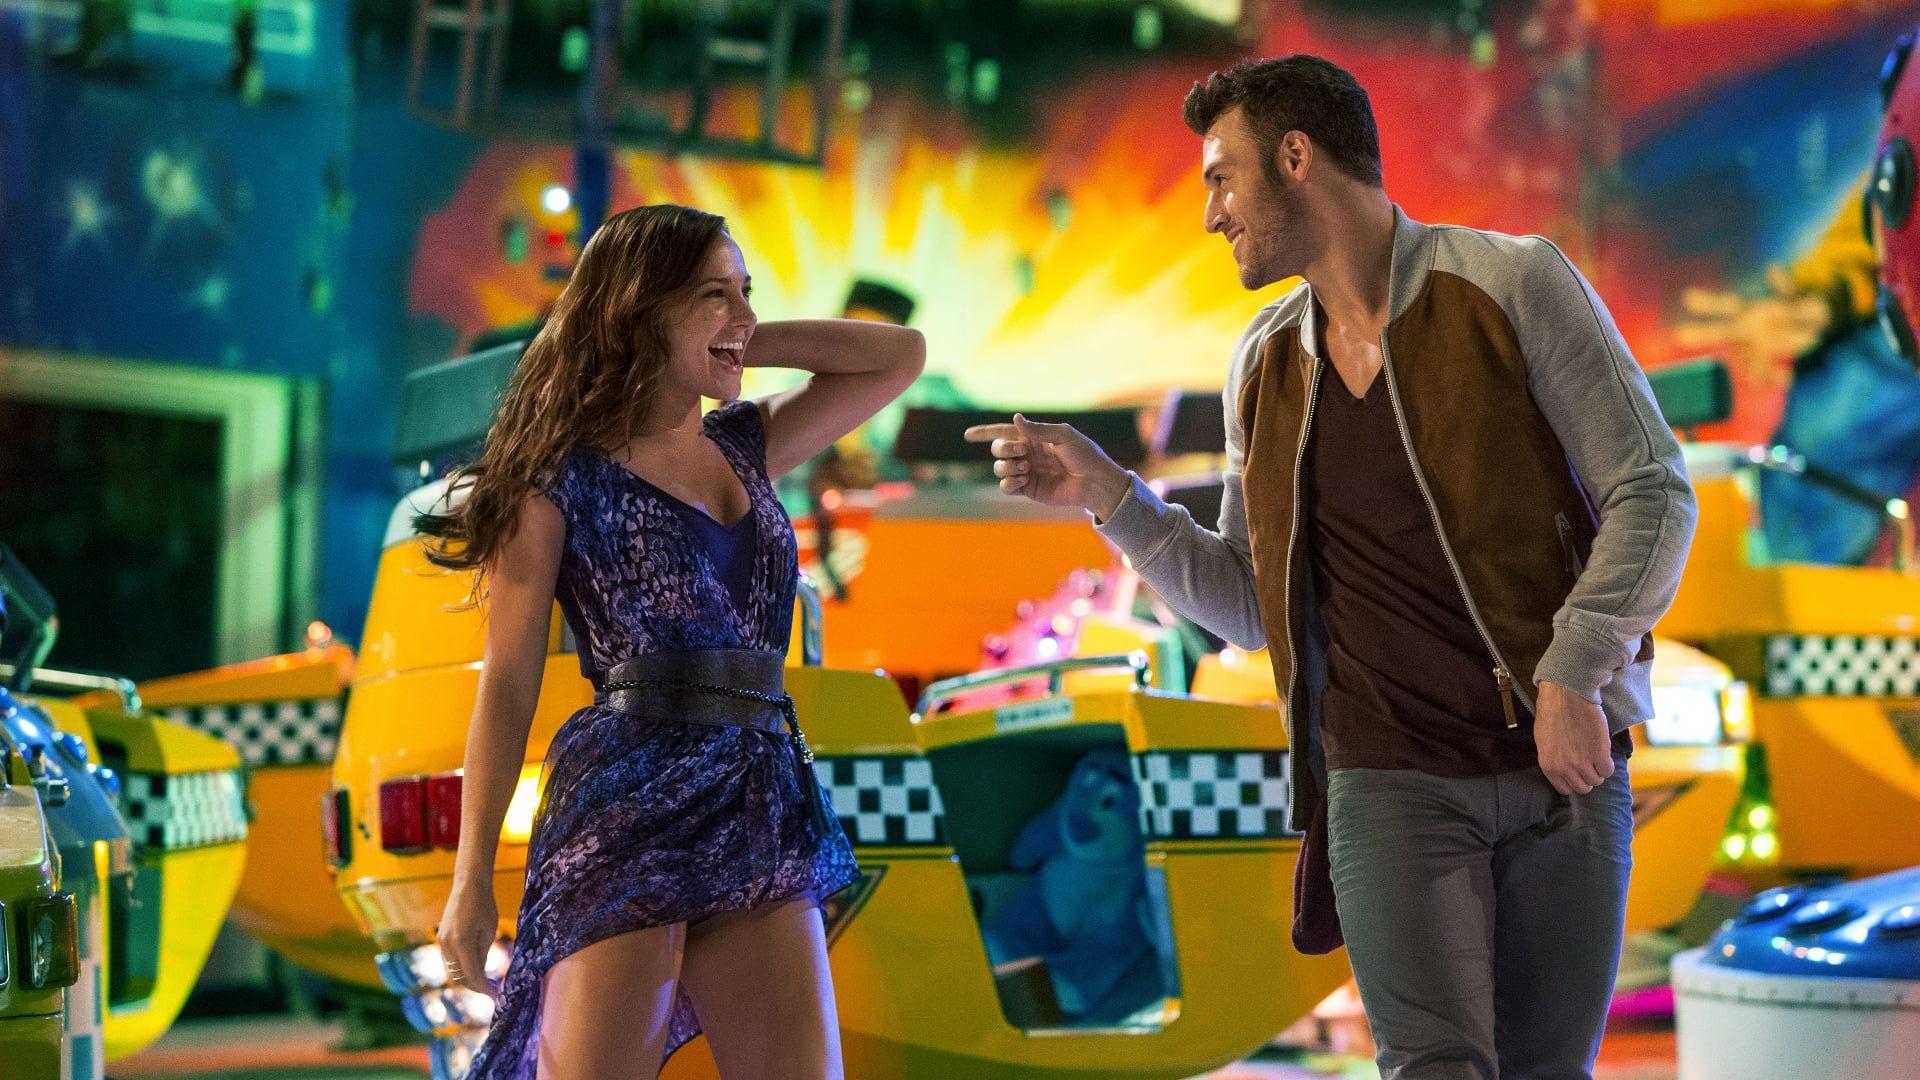 Step Up All In 2014 Online Teljes Film Filmek Magyarul Letoltes Hd Camille Andie Sean Moose Es Az Eddigi Step Up Reszek Profi Tan Step Up Dansskola Miami